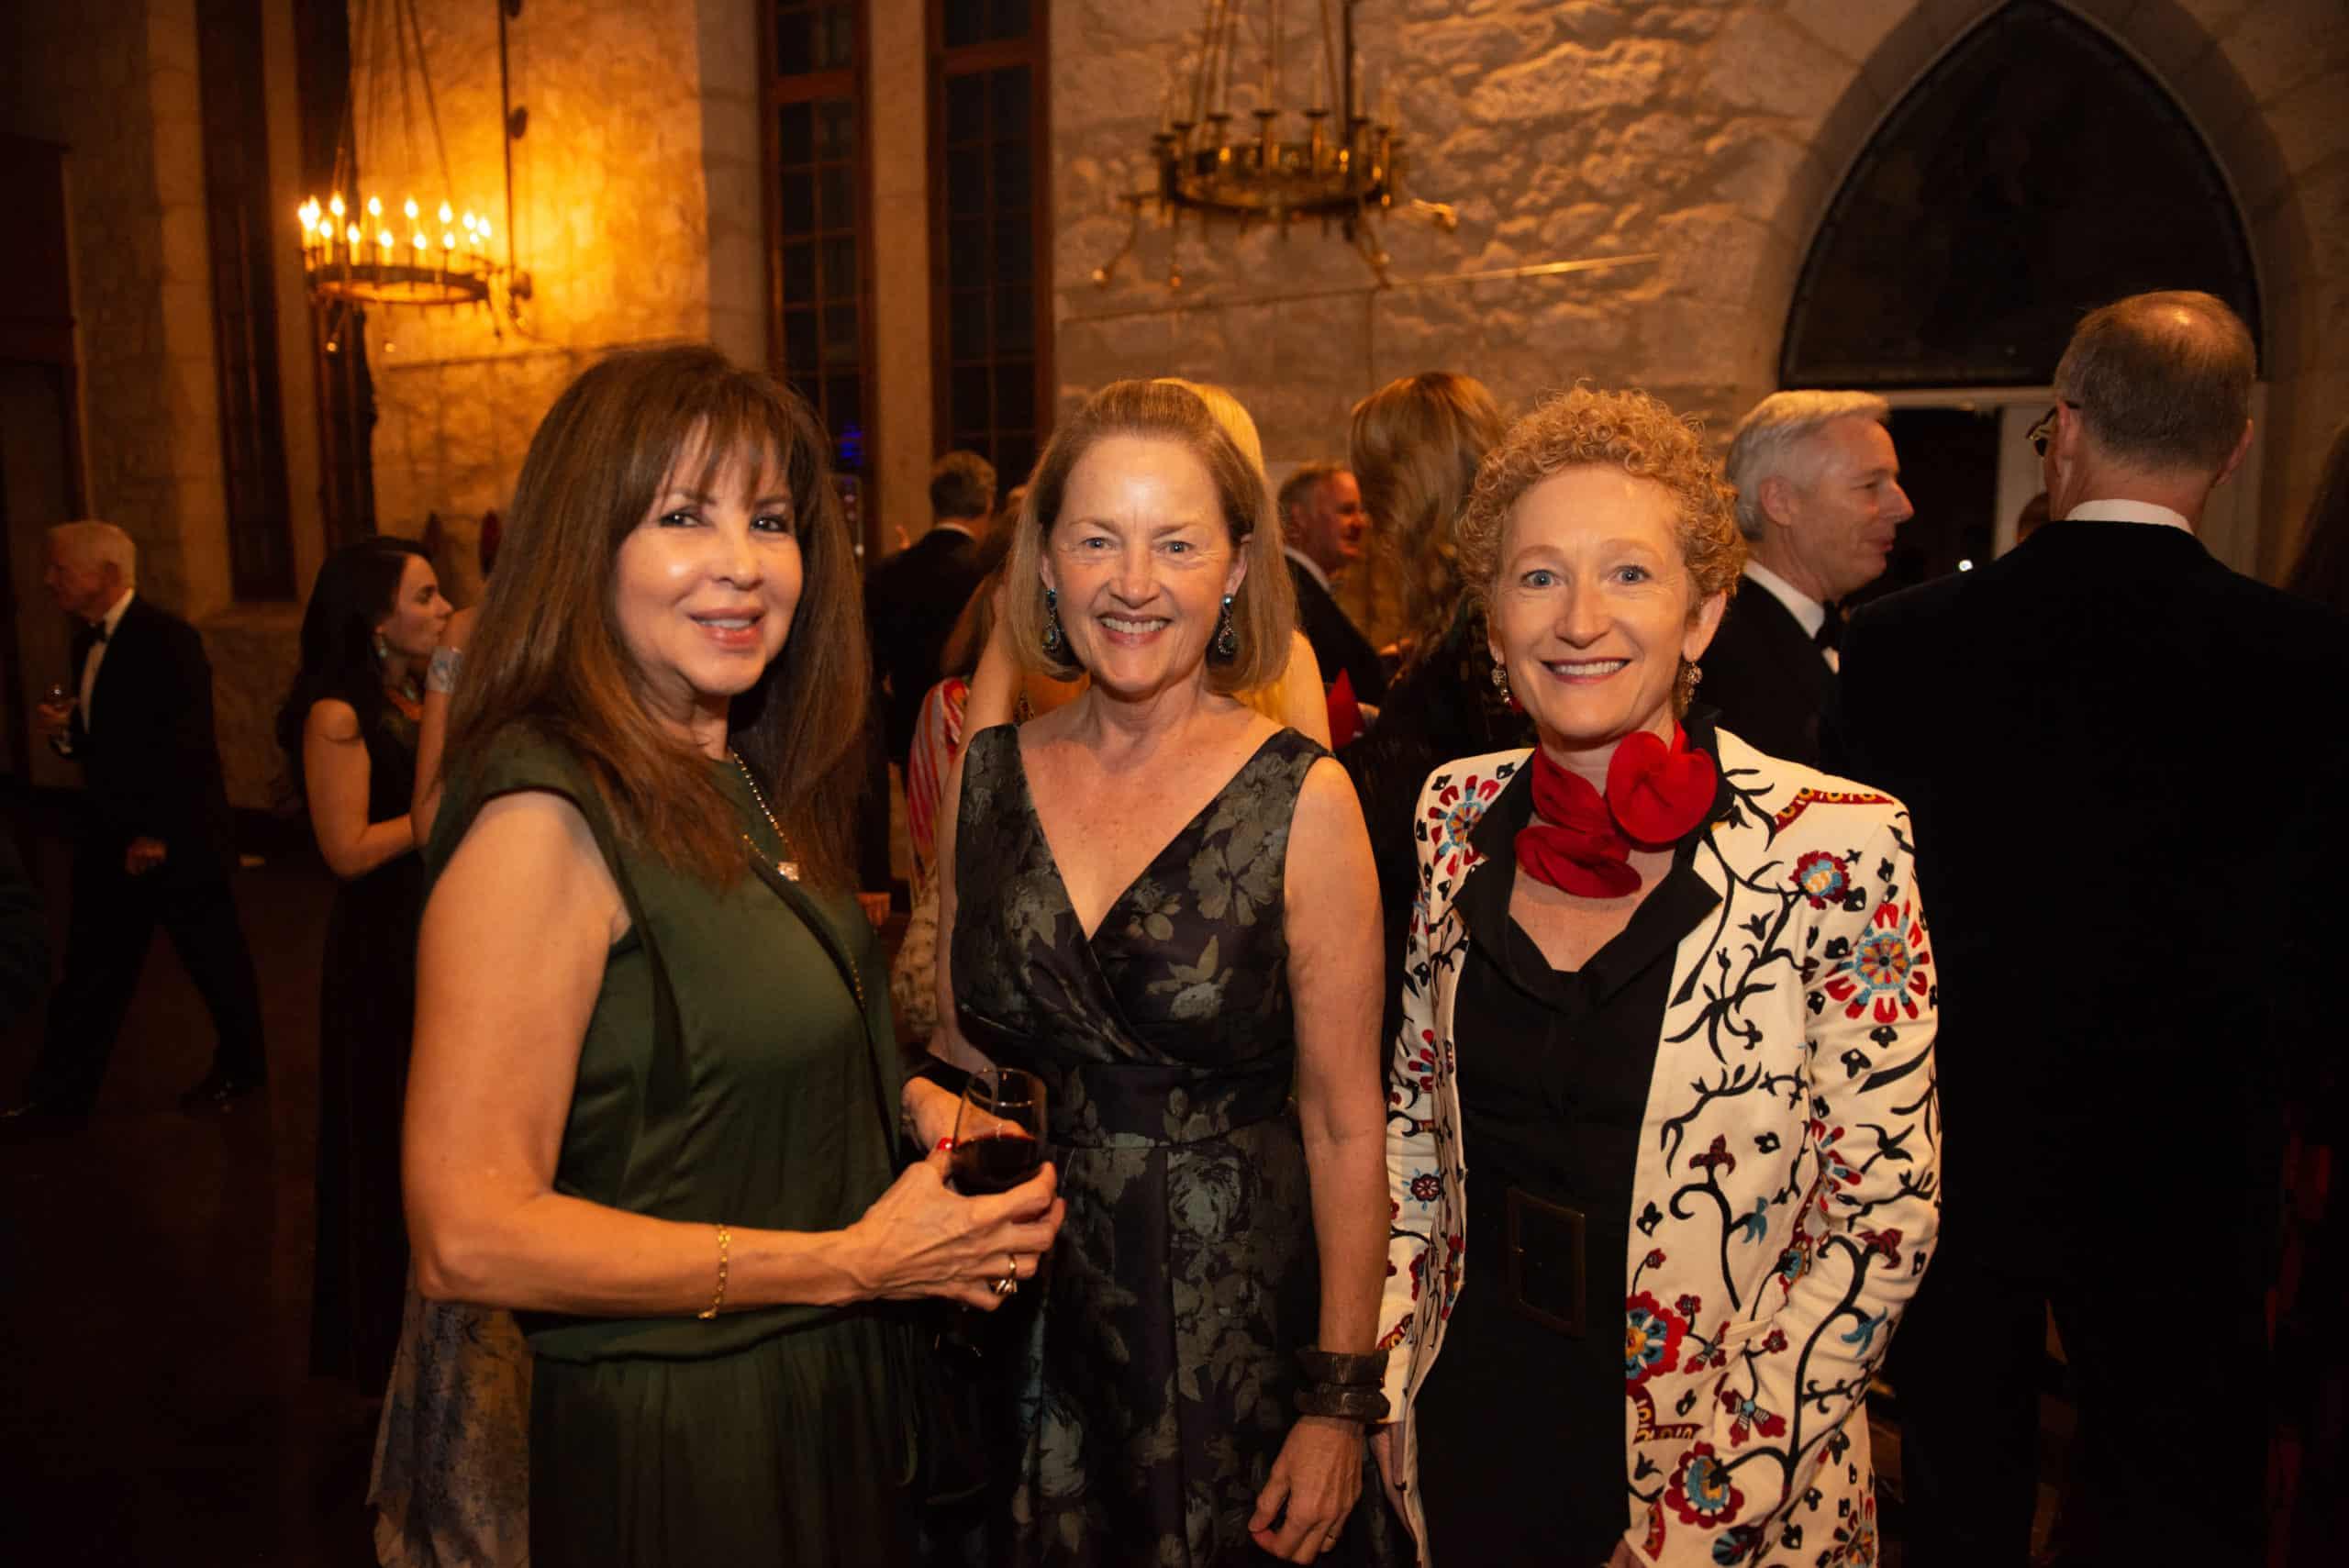 Norma Bodevin, Paula Owen and Karina Dolgin